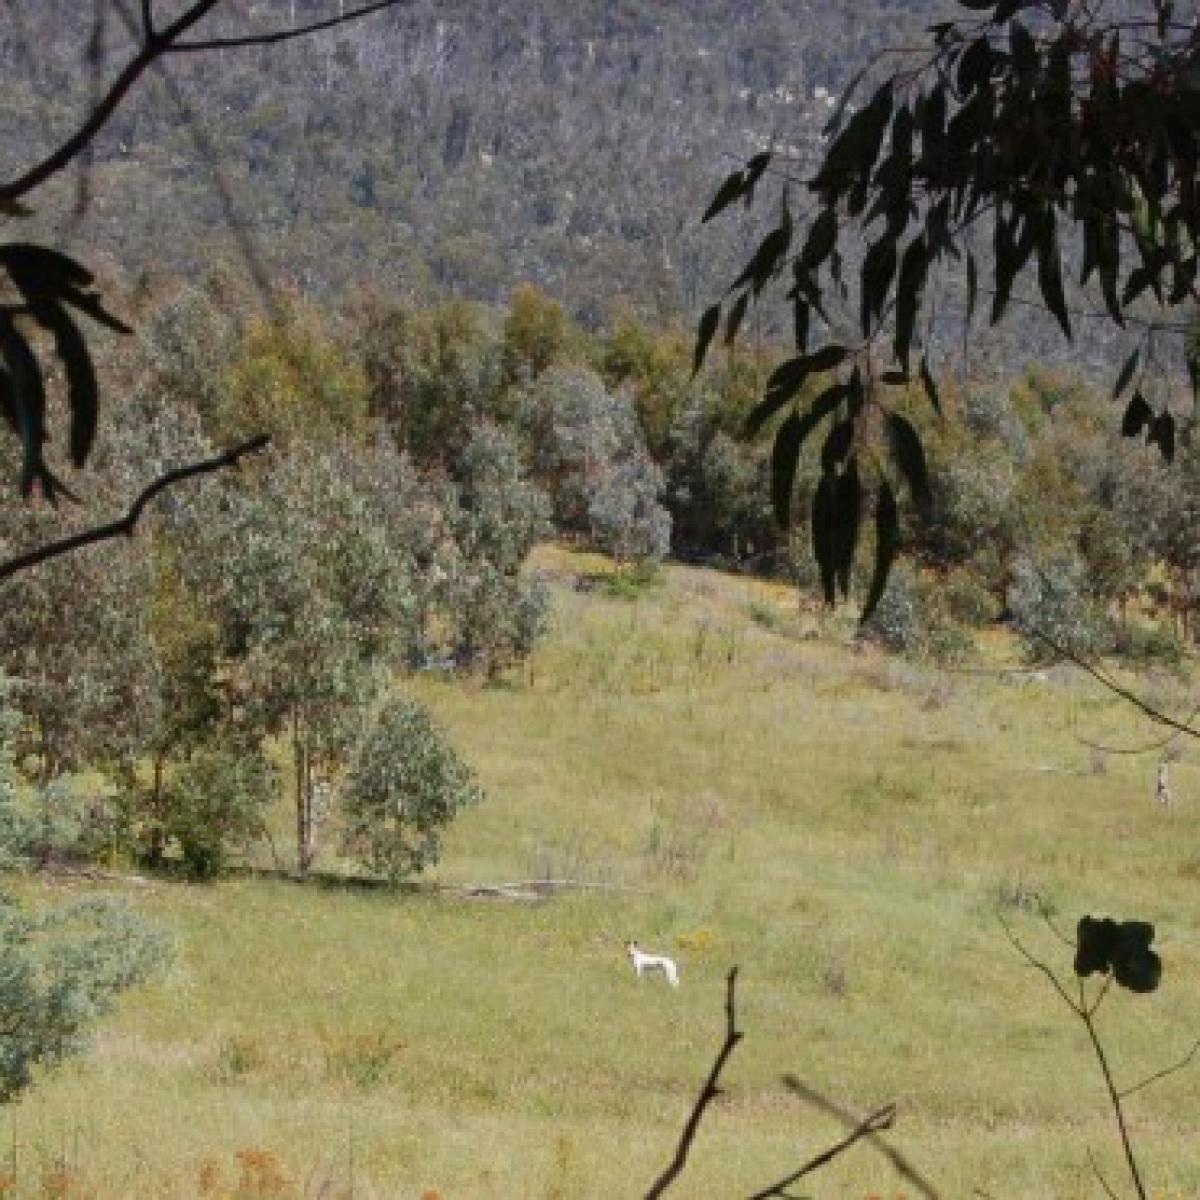 Dingo (Canis lupus dingo) or Warrigal